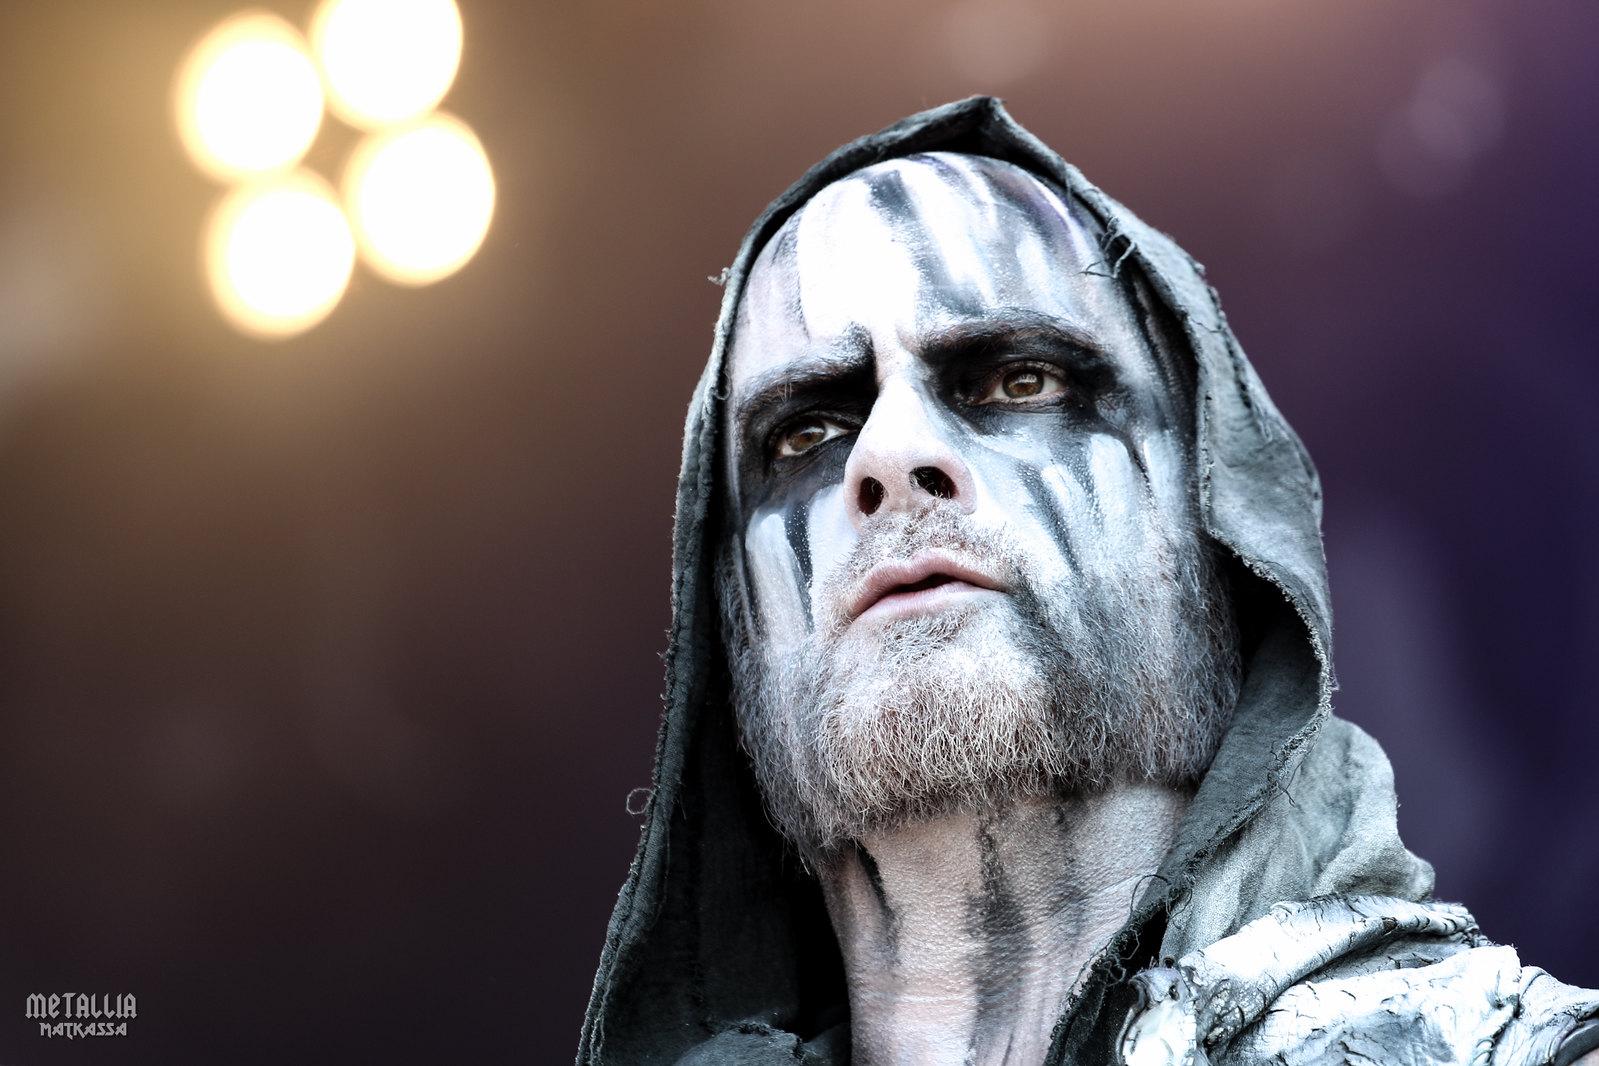 tuska 2016, tuska metal festival, tuska festival, hellsinki for headbangers, finnish metal festivals, metal festival, primordial